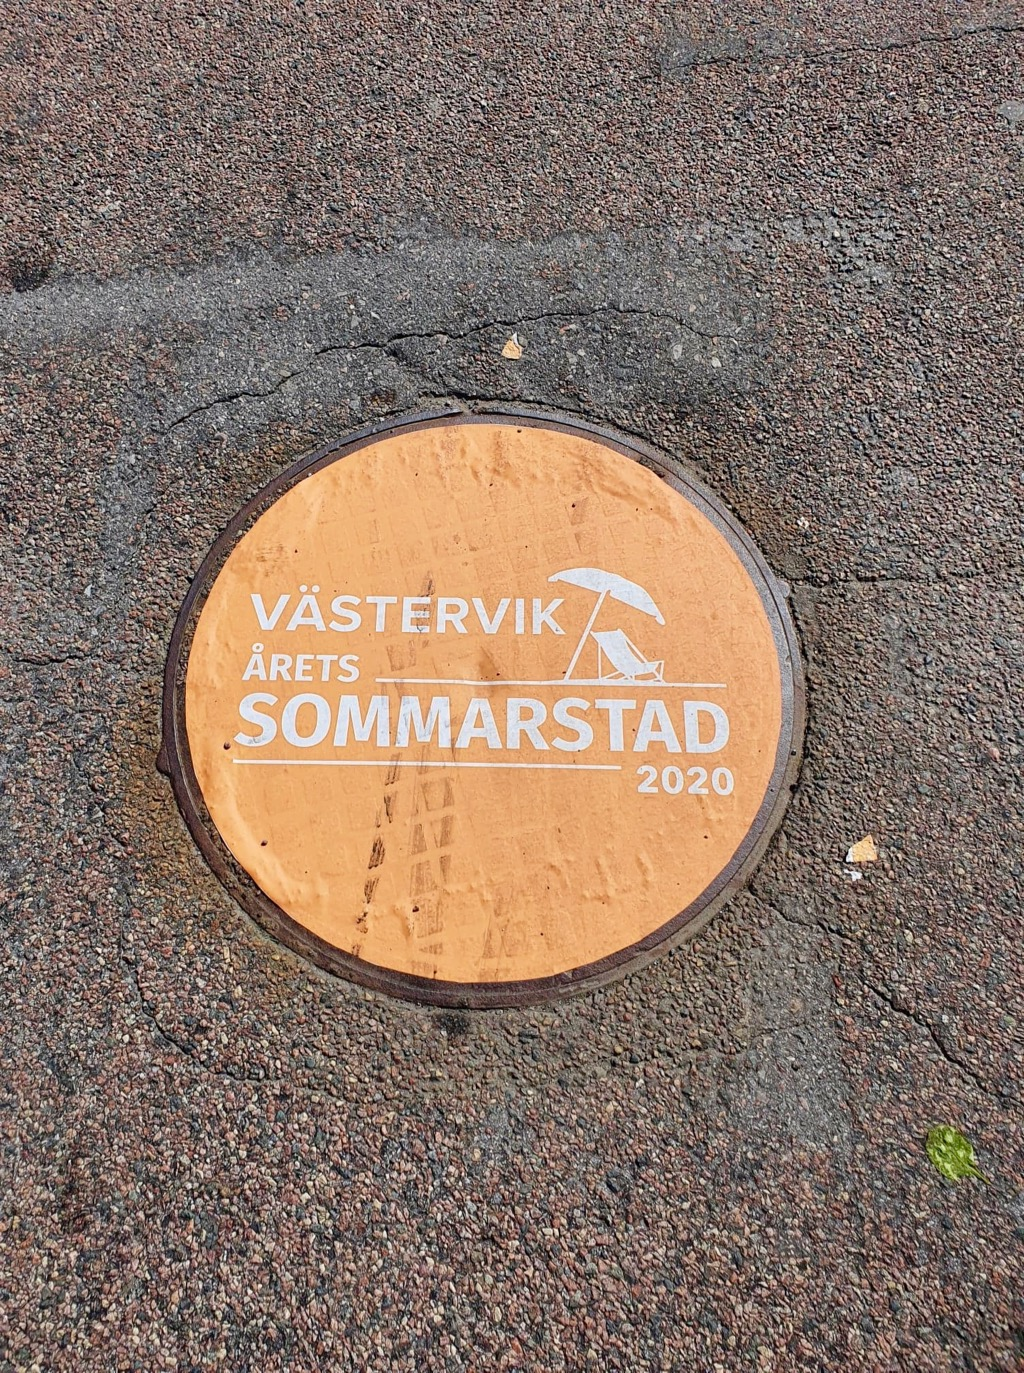 Västervik årets sommarstad